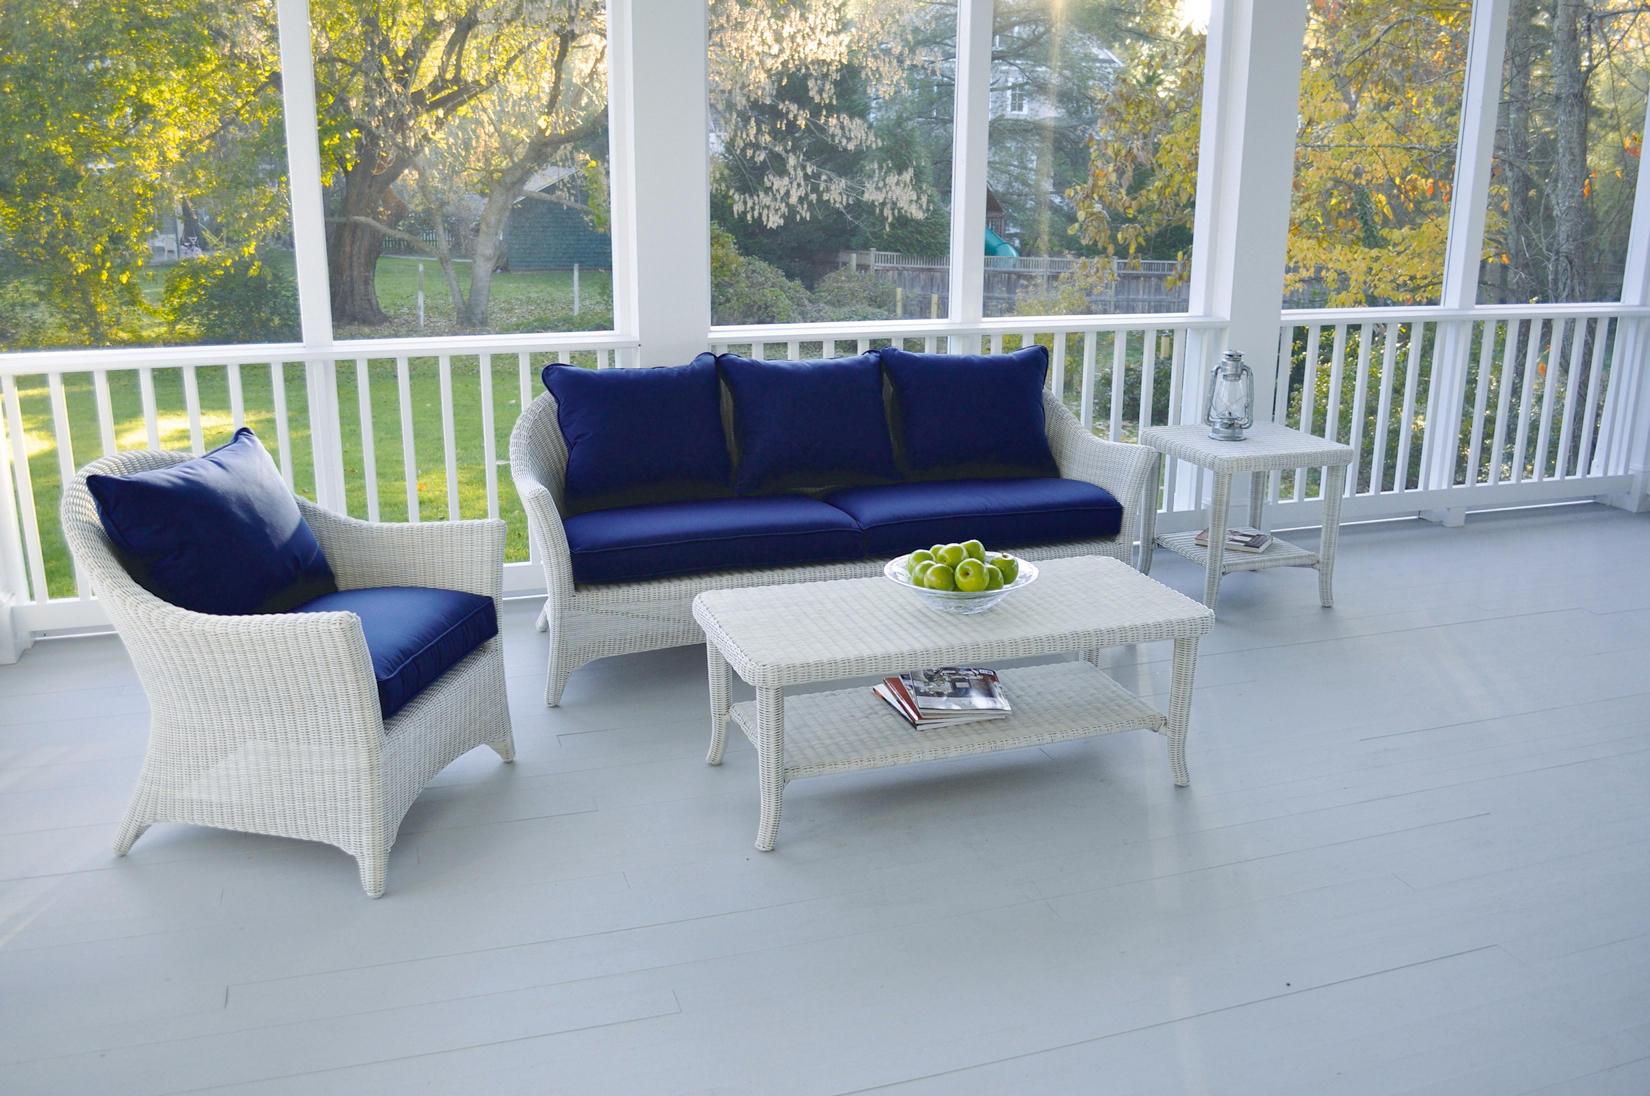 Bainbridge Cape Cod Sofa and Lounge Chair and Ottoman